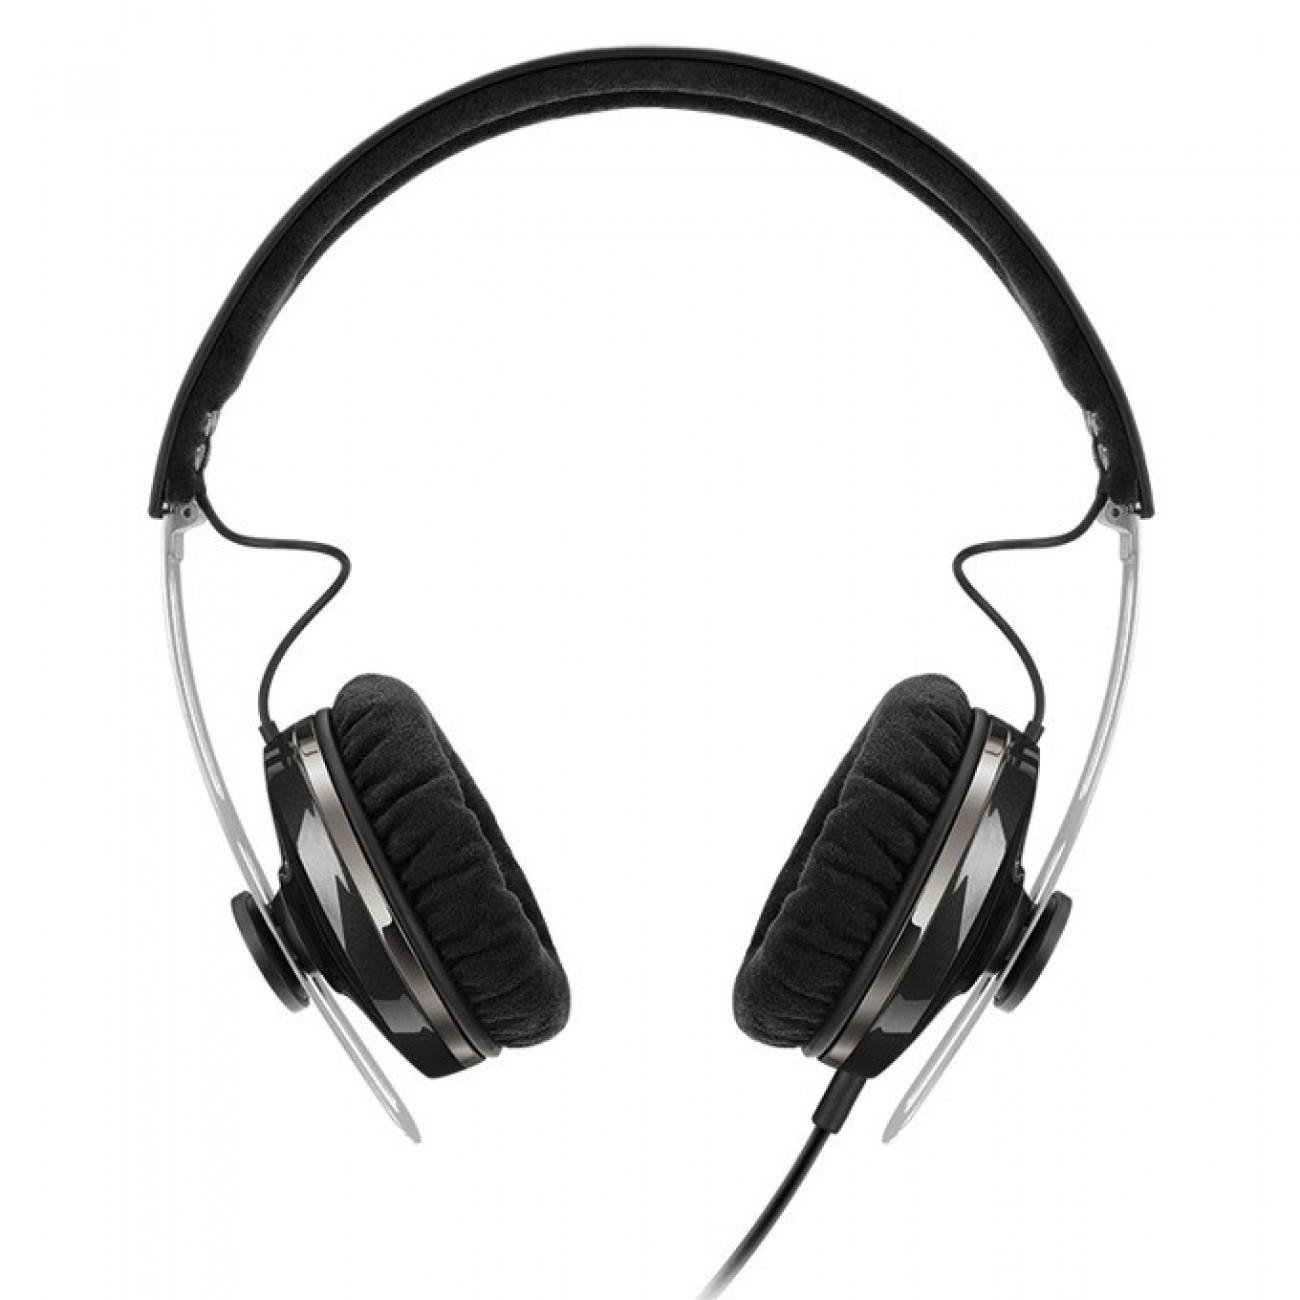 Слушалки Sennheiser Momentum On-Ear G (M2 OEG), микрофон, 16Hz-22kНz честотен диапазон, 1.4 м кабел, черни в Слушалки -  | Alleop